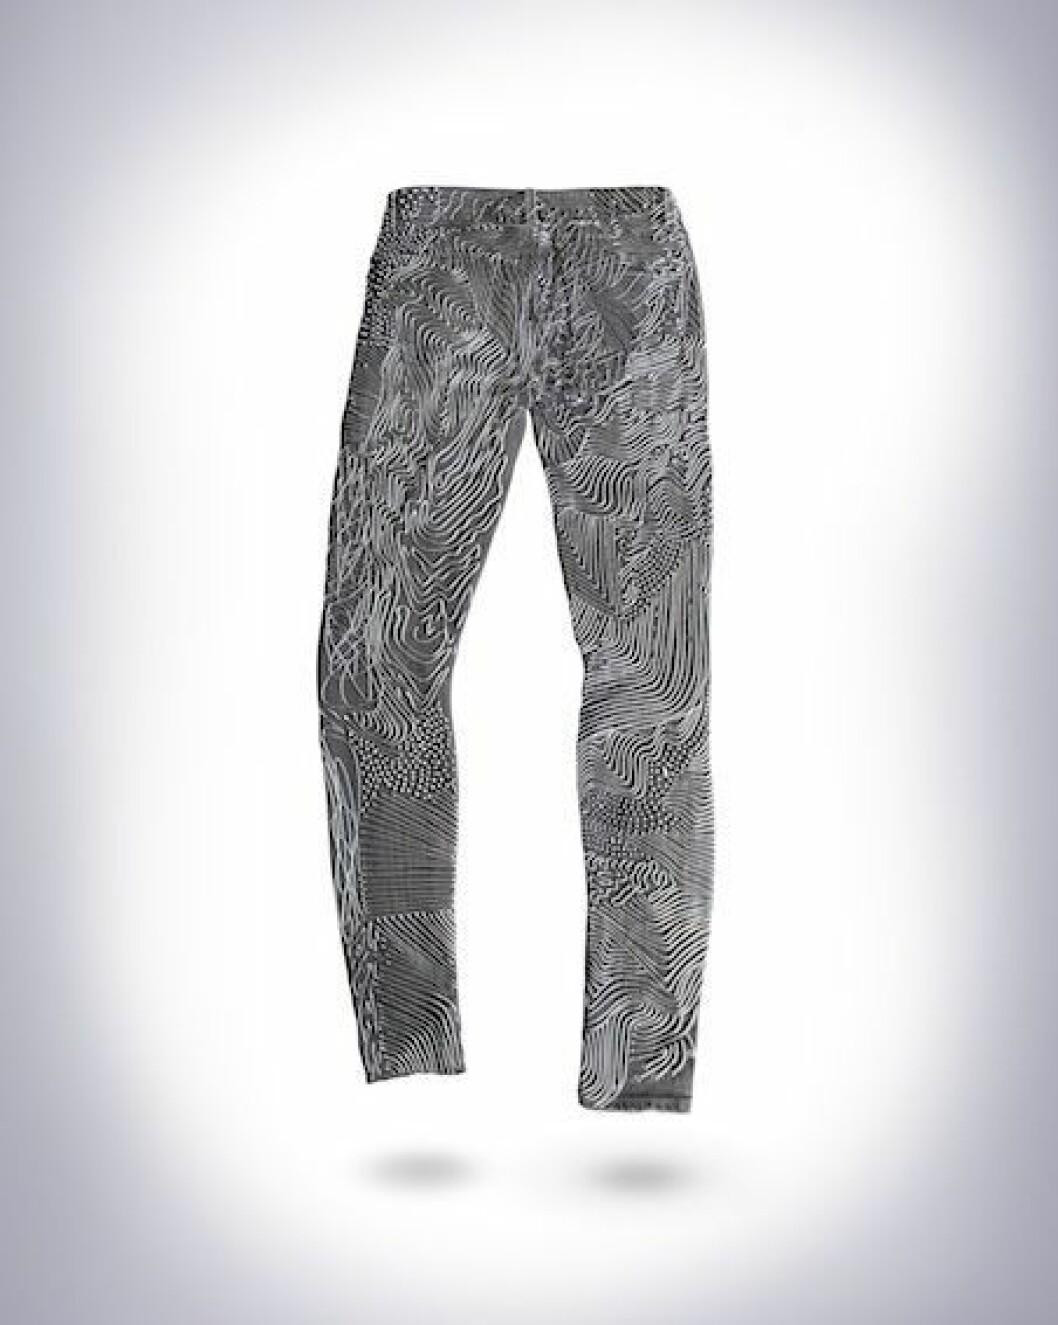 harry styles jeans